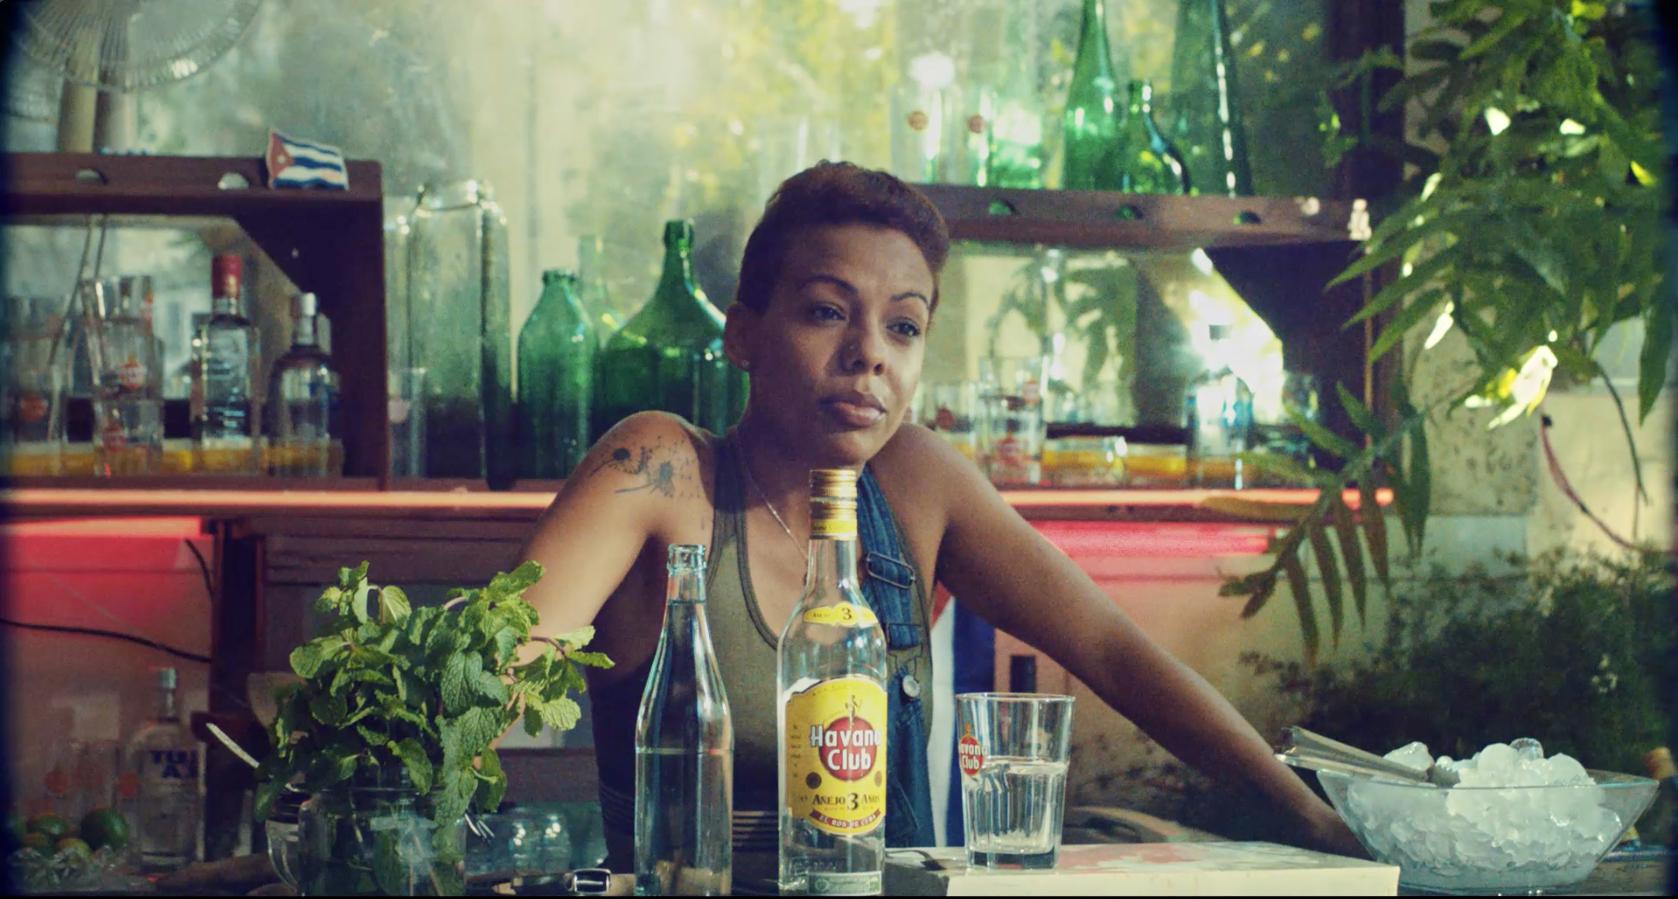 David Helman Directs 'Cuba Made Me' Spot for Havana Club and M&C Saatchi